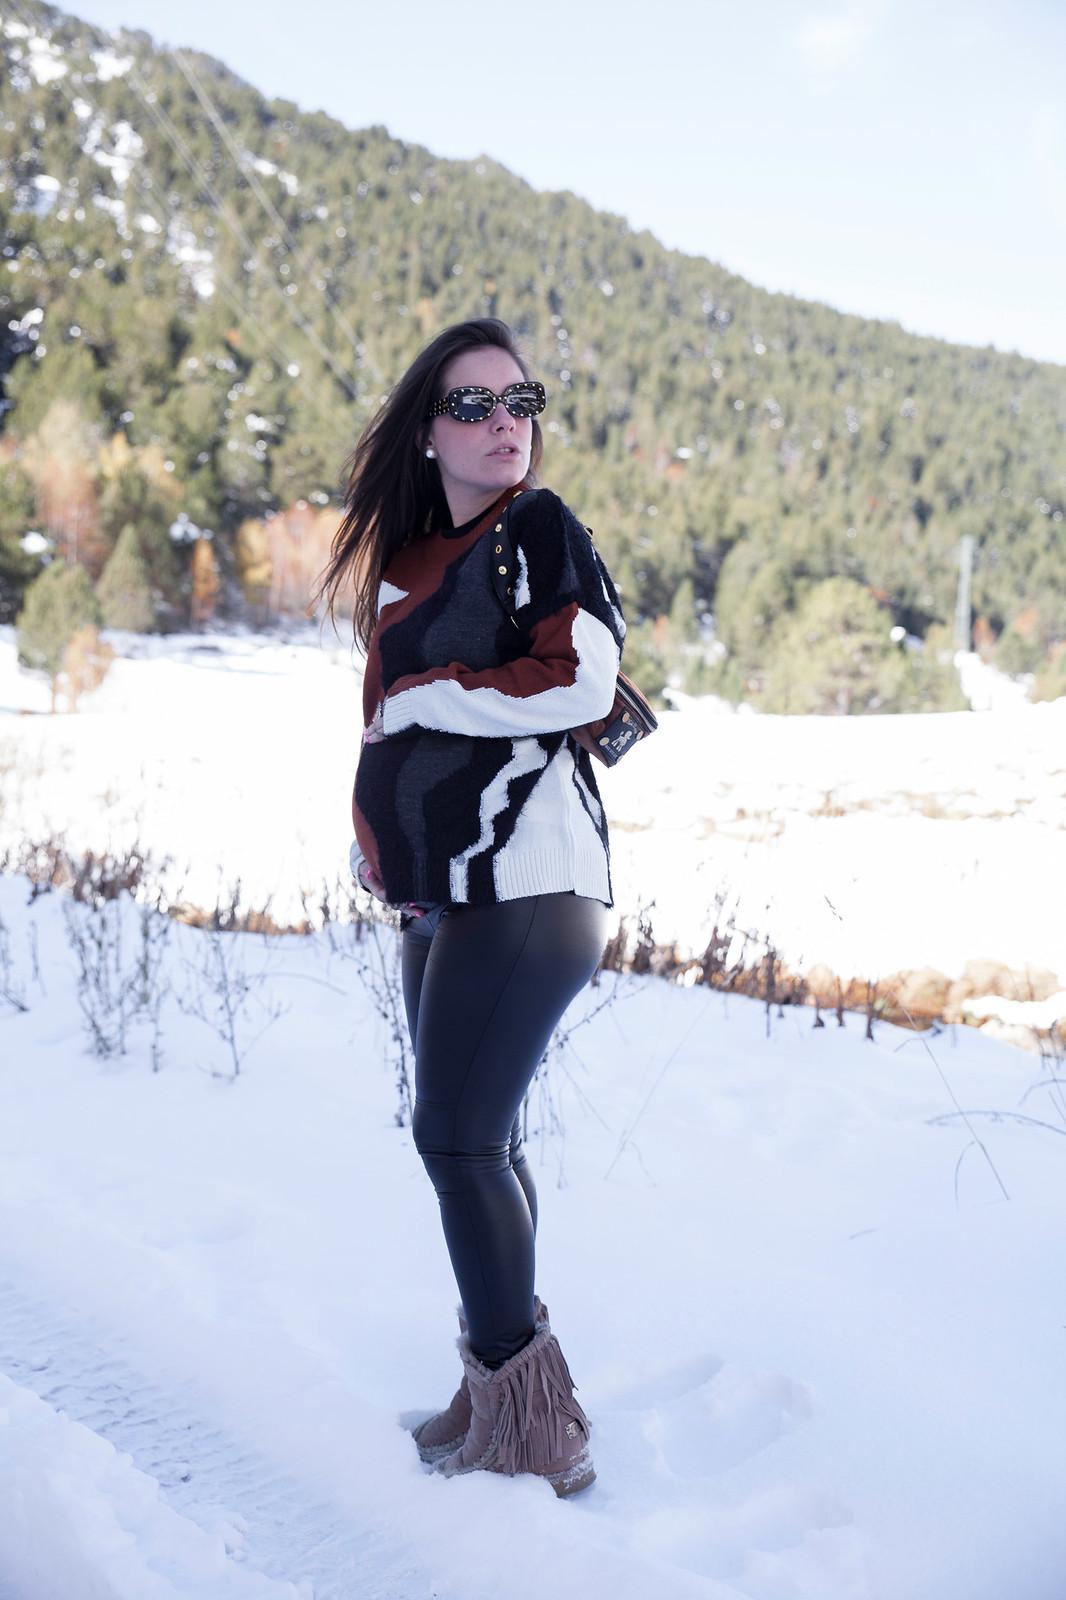 08_combinar_jersey_marron_outfit_nieve_embarazada_theguestgirl_embarazo_33semanas_pregnant_style_influencer_barcelona_embarazada_fashion_snow